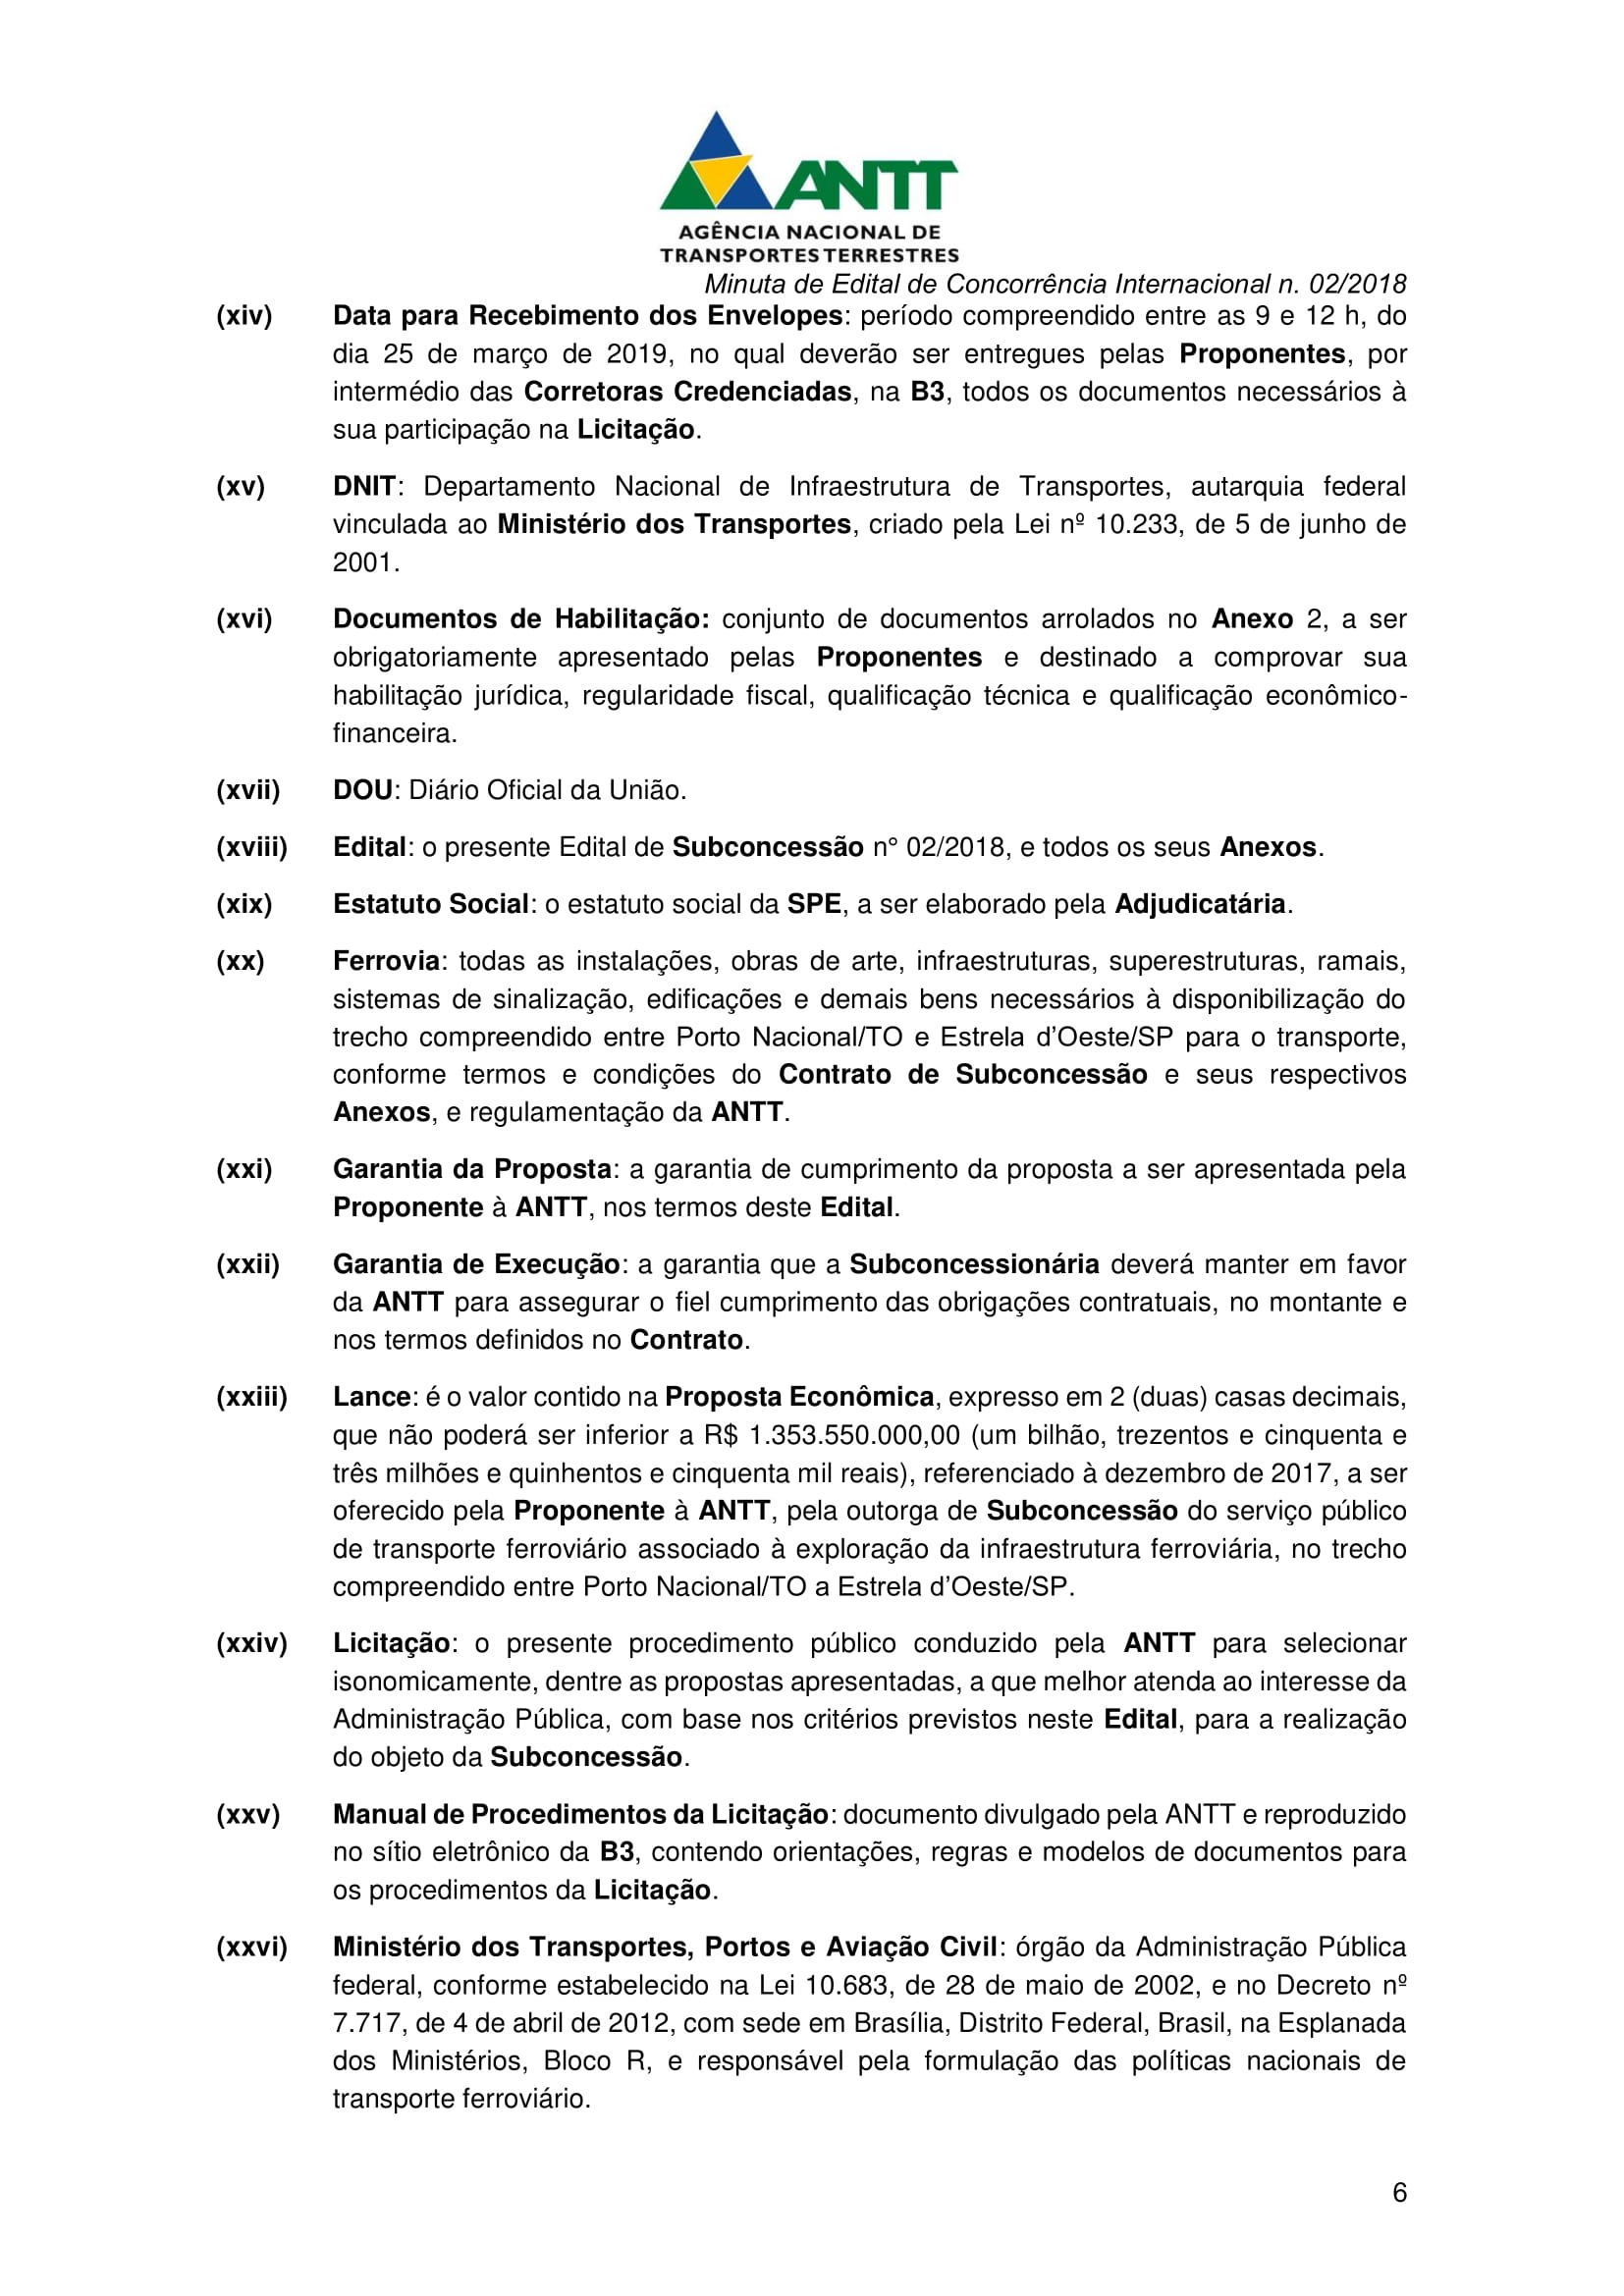 minuta_de_edital_-_porto_nacional-estrela_doeste-06